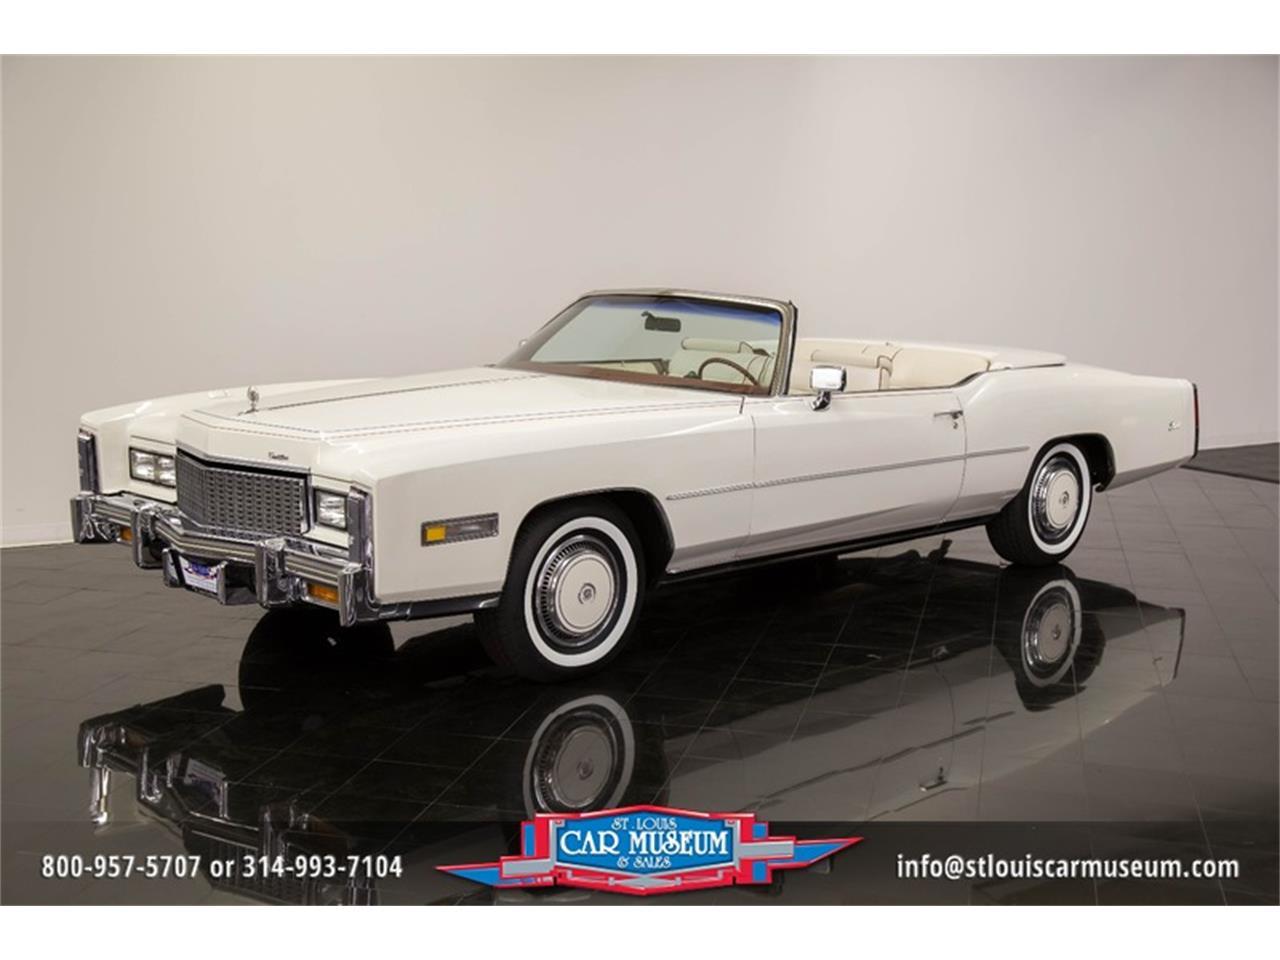 1976 Cadillac Eldorado (CC-1060521) for sale in St. Louis, Missouri